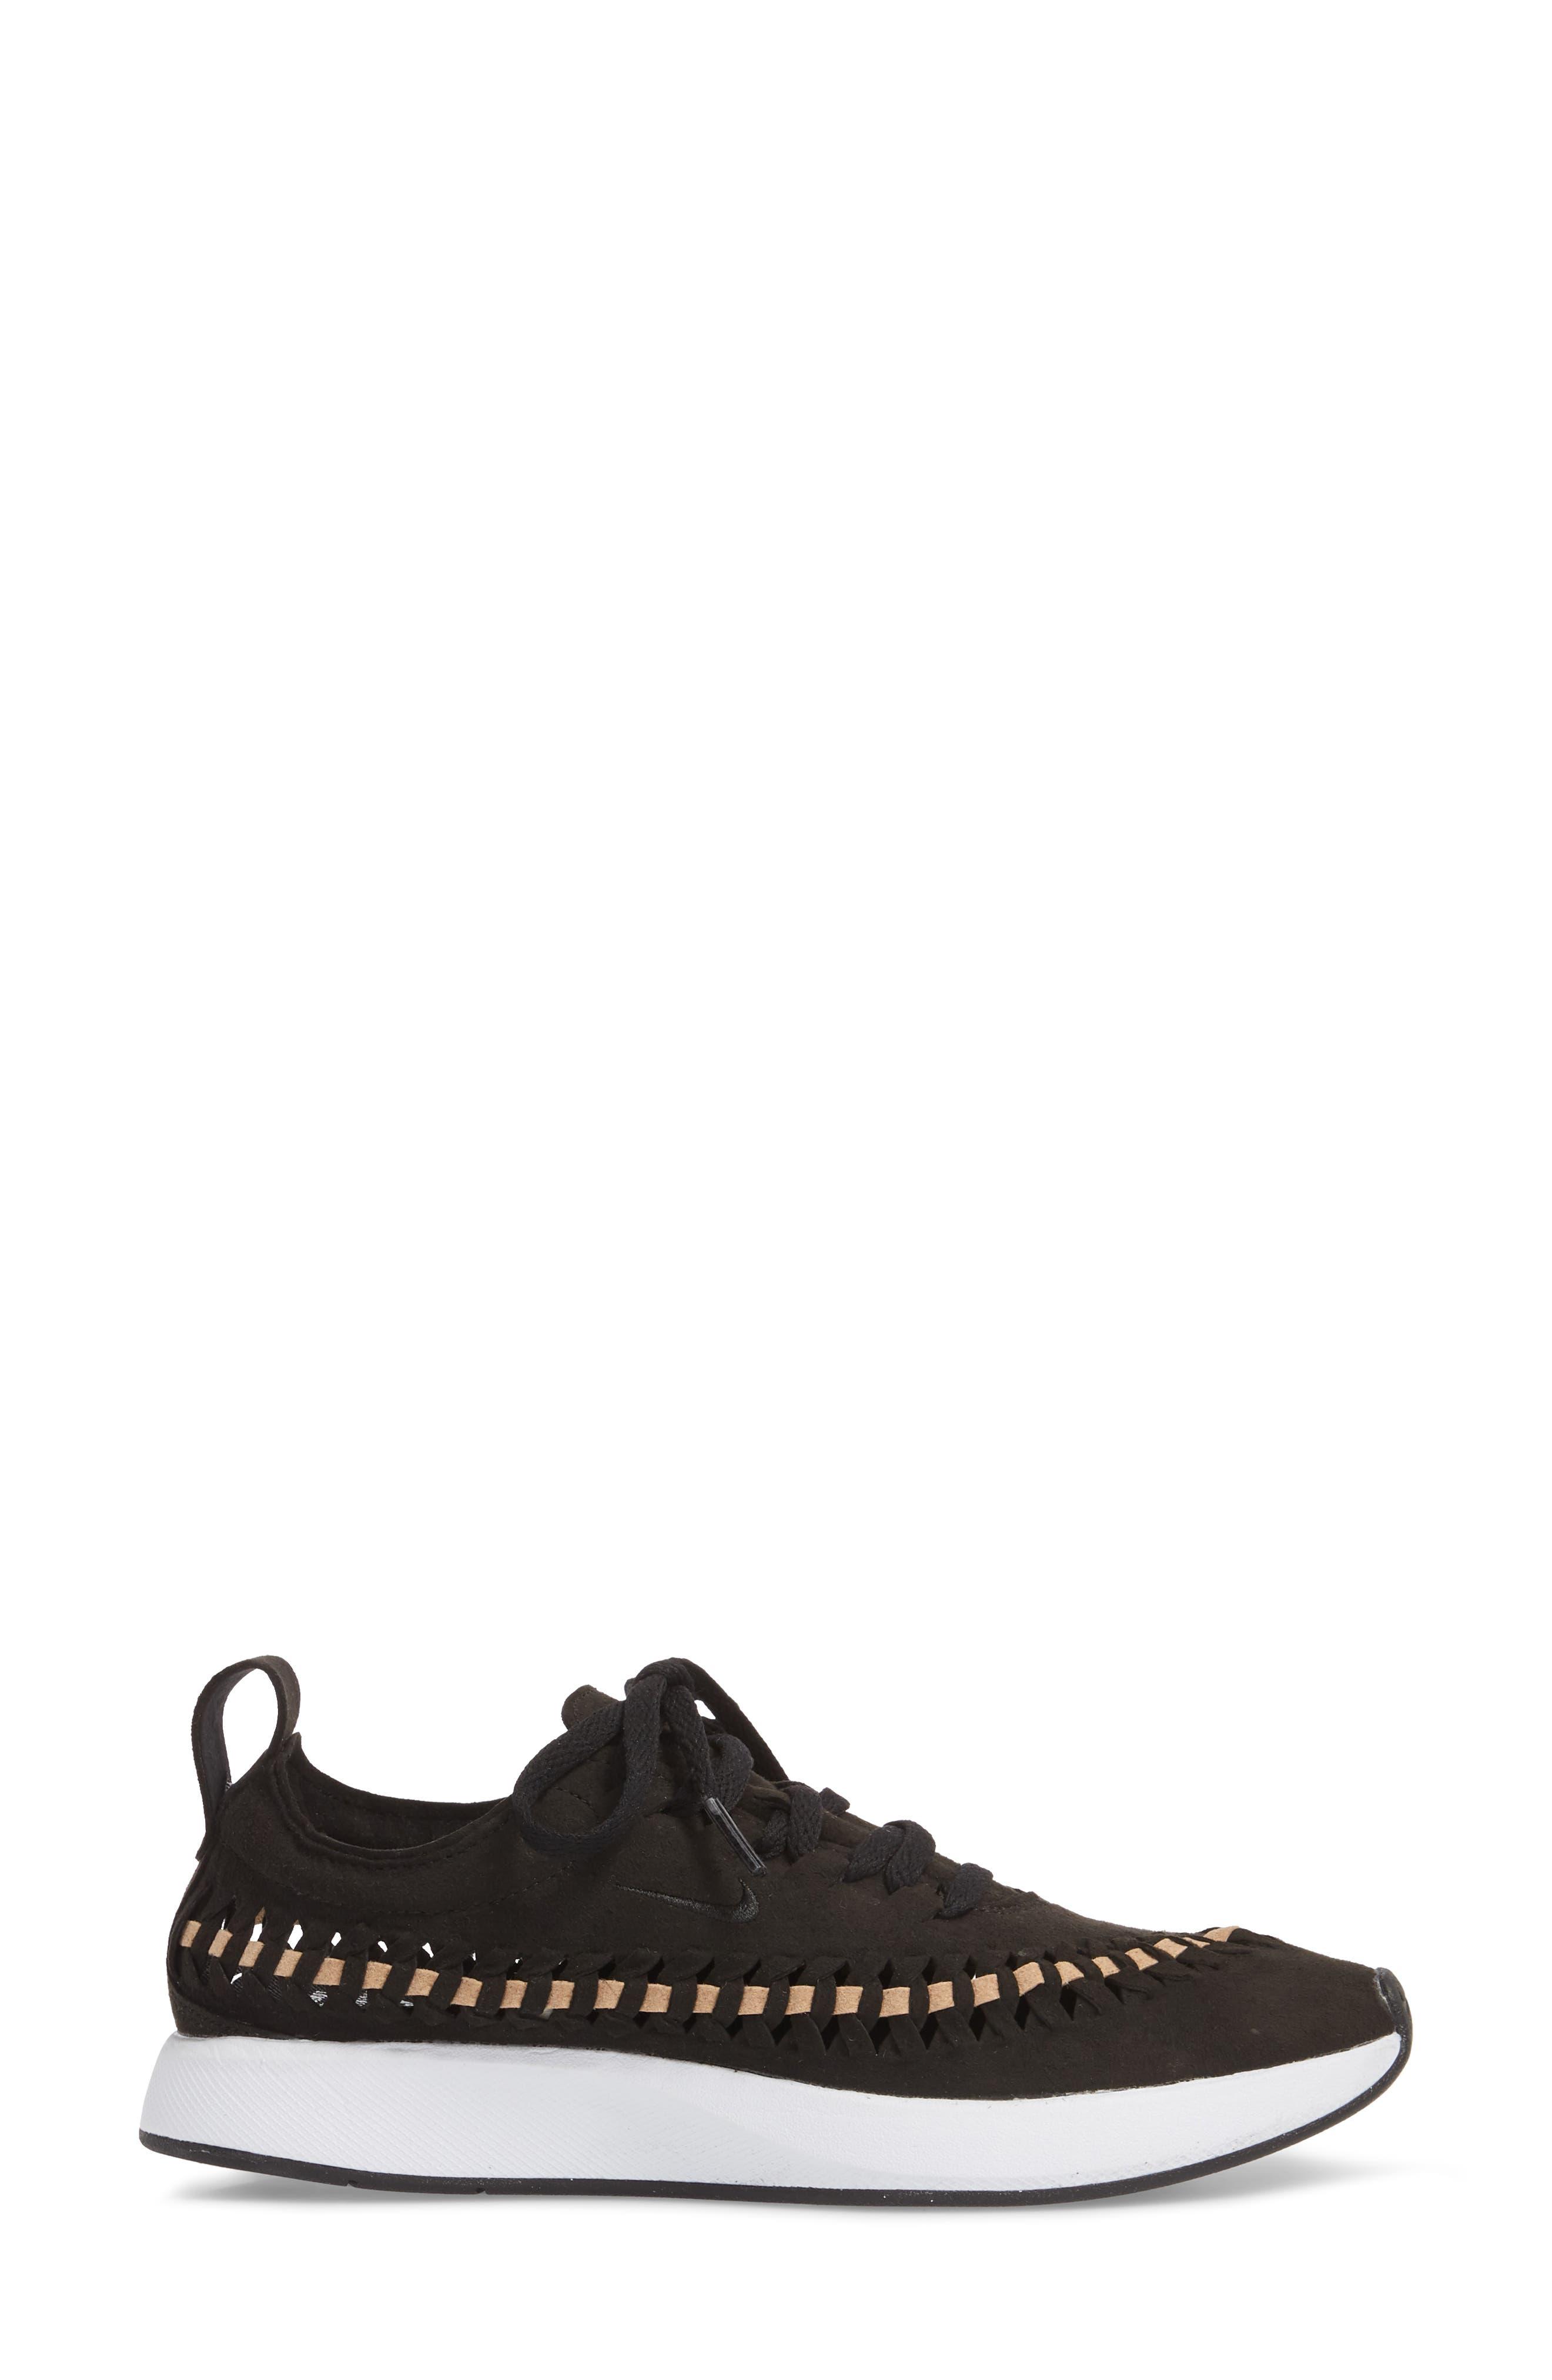 Dualtone Racer Woven Sneaker,                             Alternate thumbnail 3, color,                             001